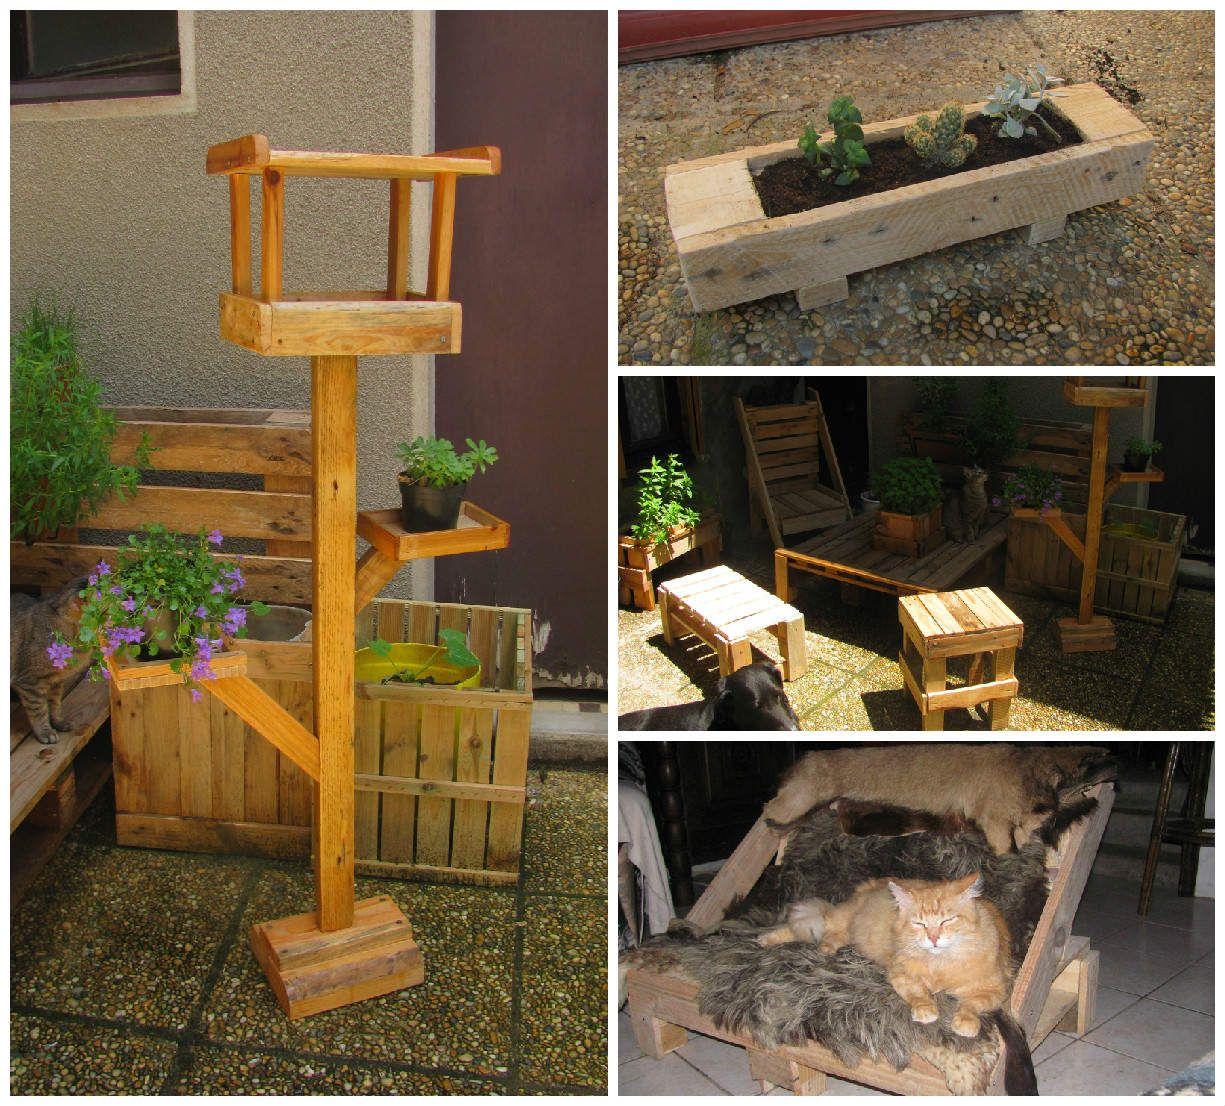 Complete Pallet Garden Set Pallet Ideas 1001 Pallets: Pallets Stuff For Your Garden